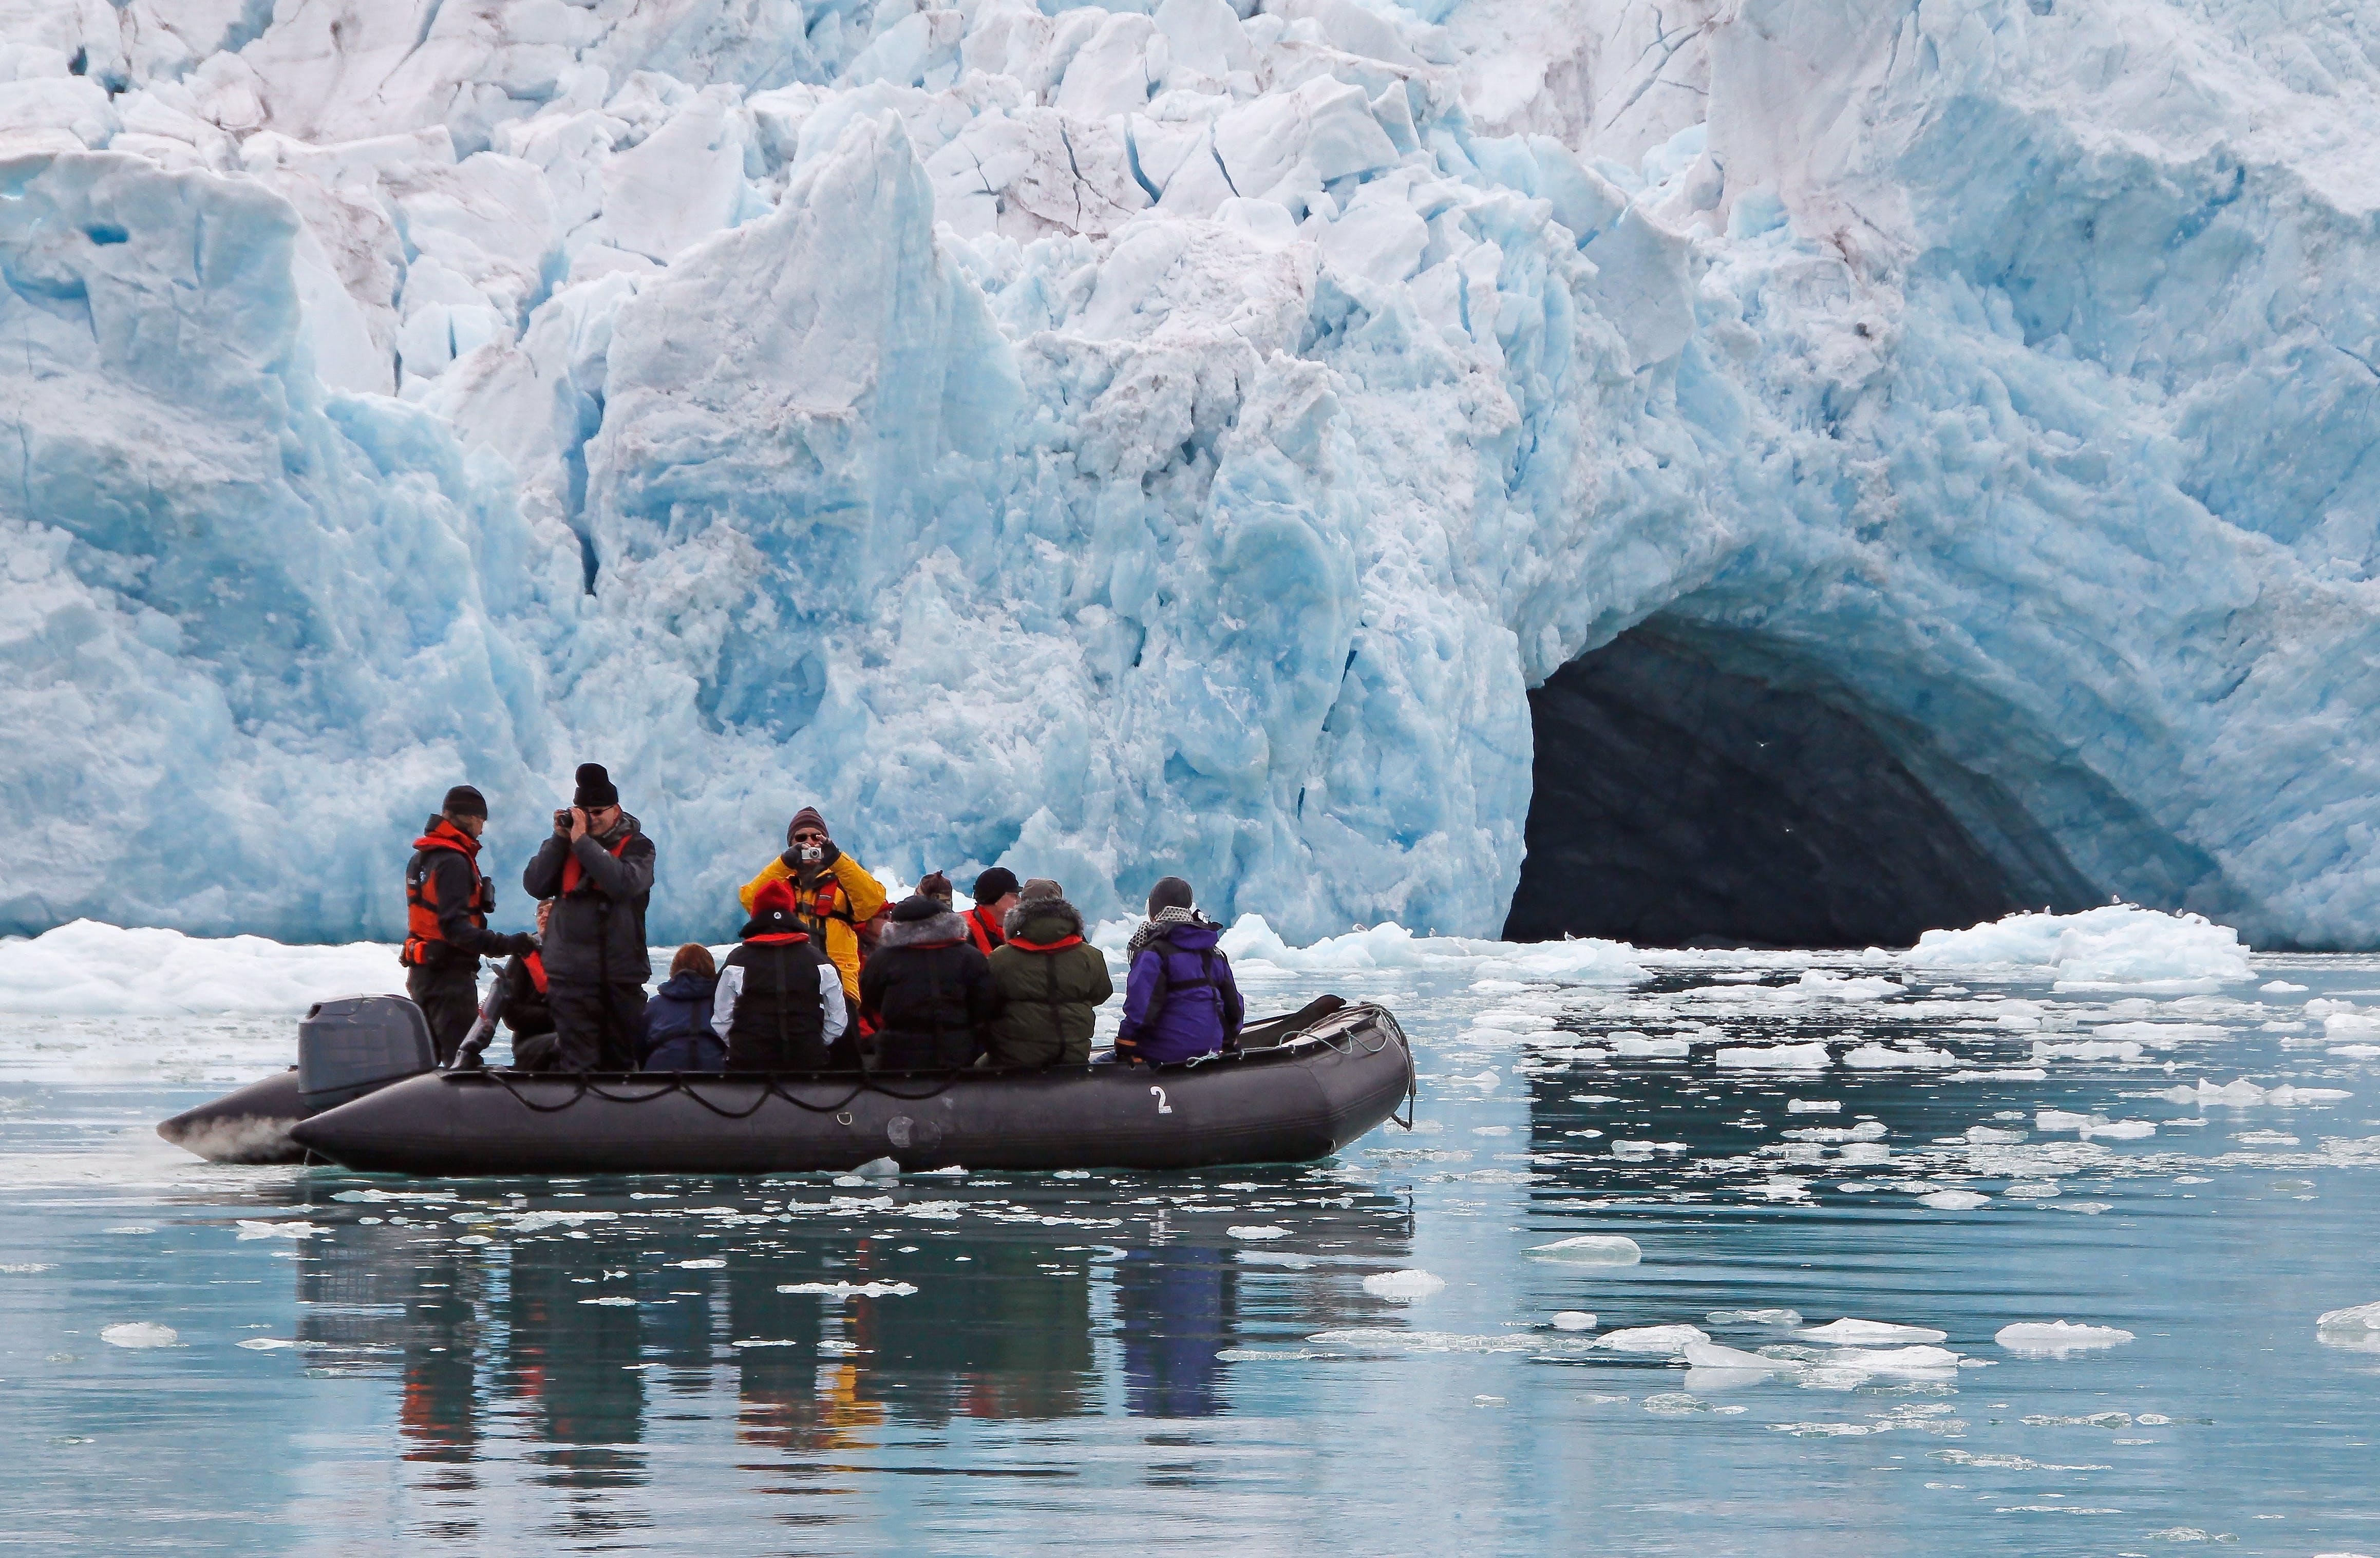 Arctic Zodiac boat near iceberg